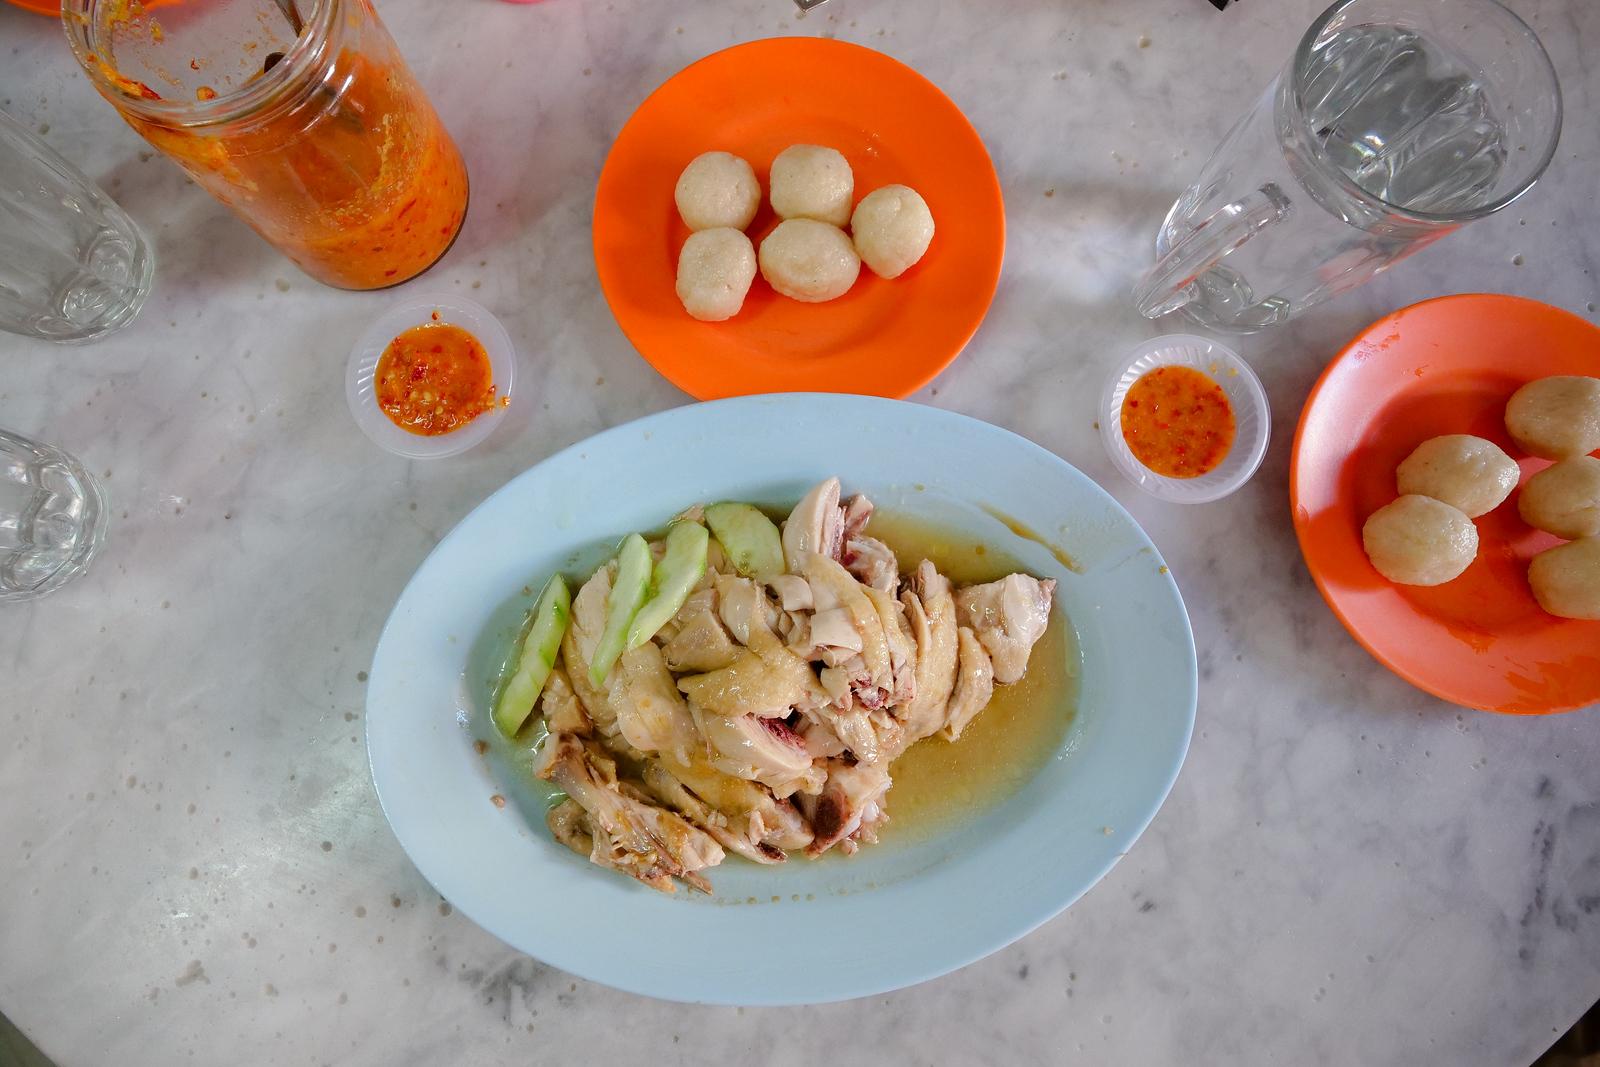 Traditional recipes continue at this family-owned restaurant, Kedai Kopi Chung Wah in Melaka, Malaysia